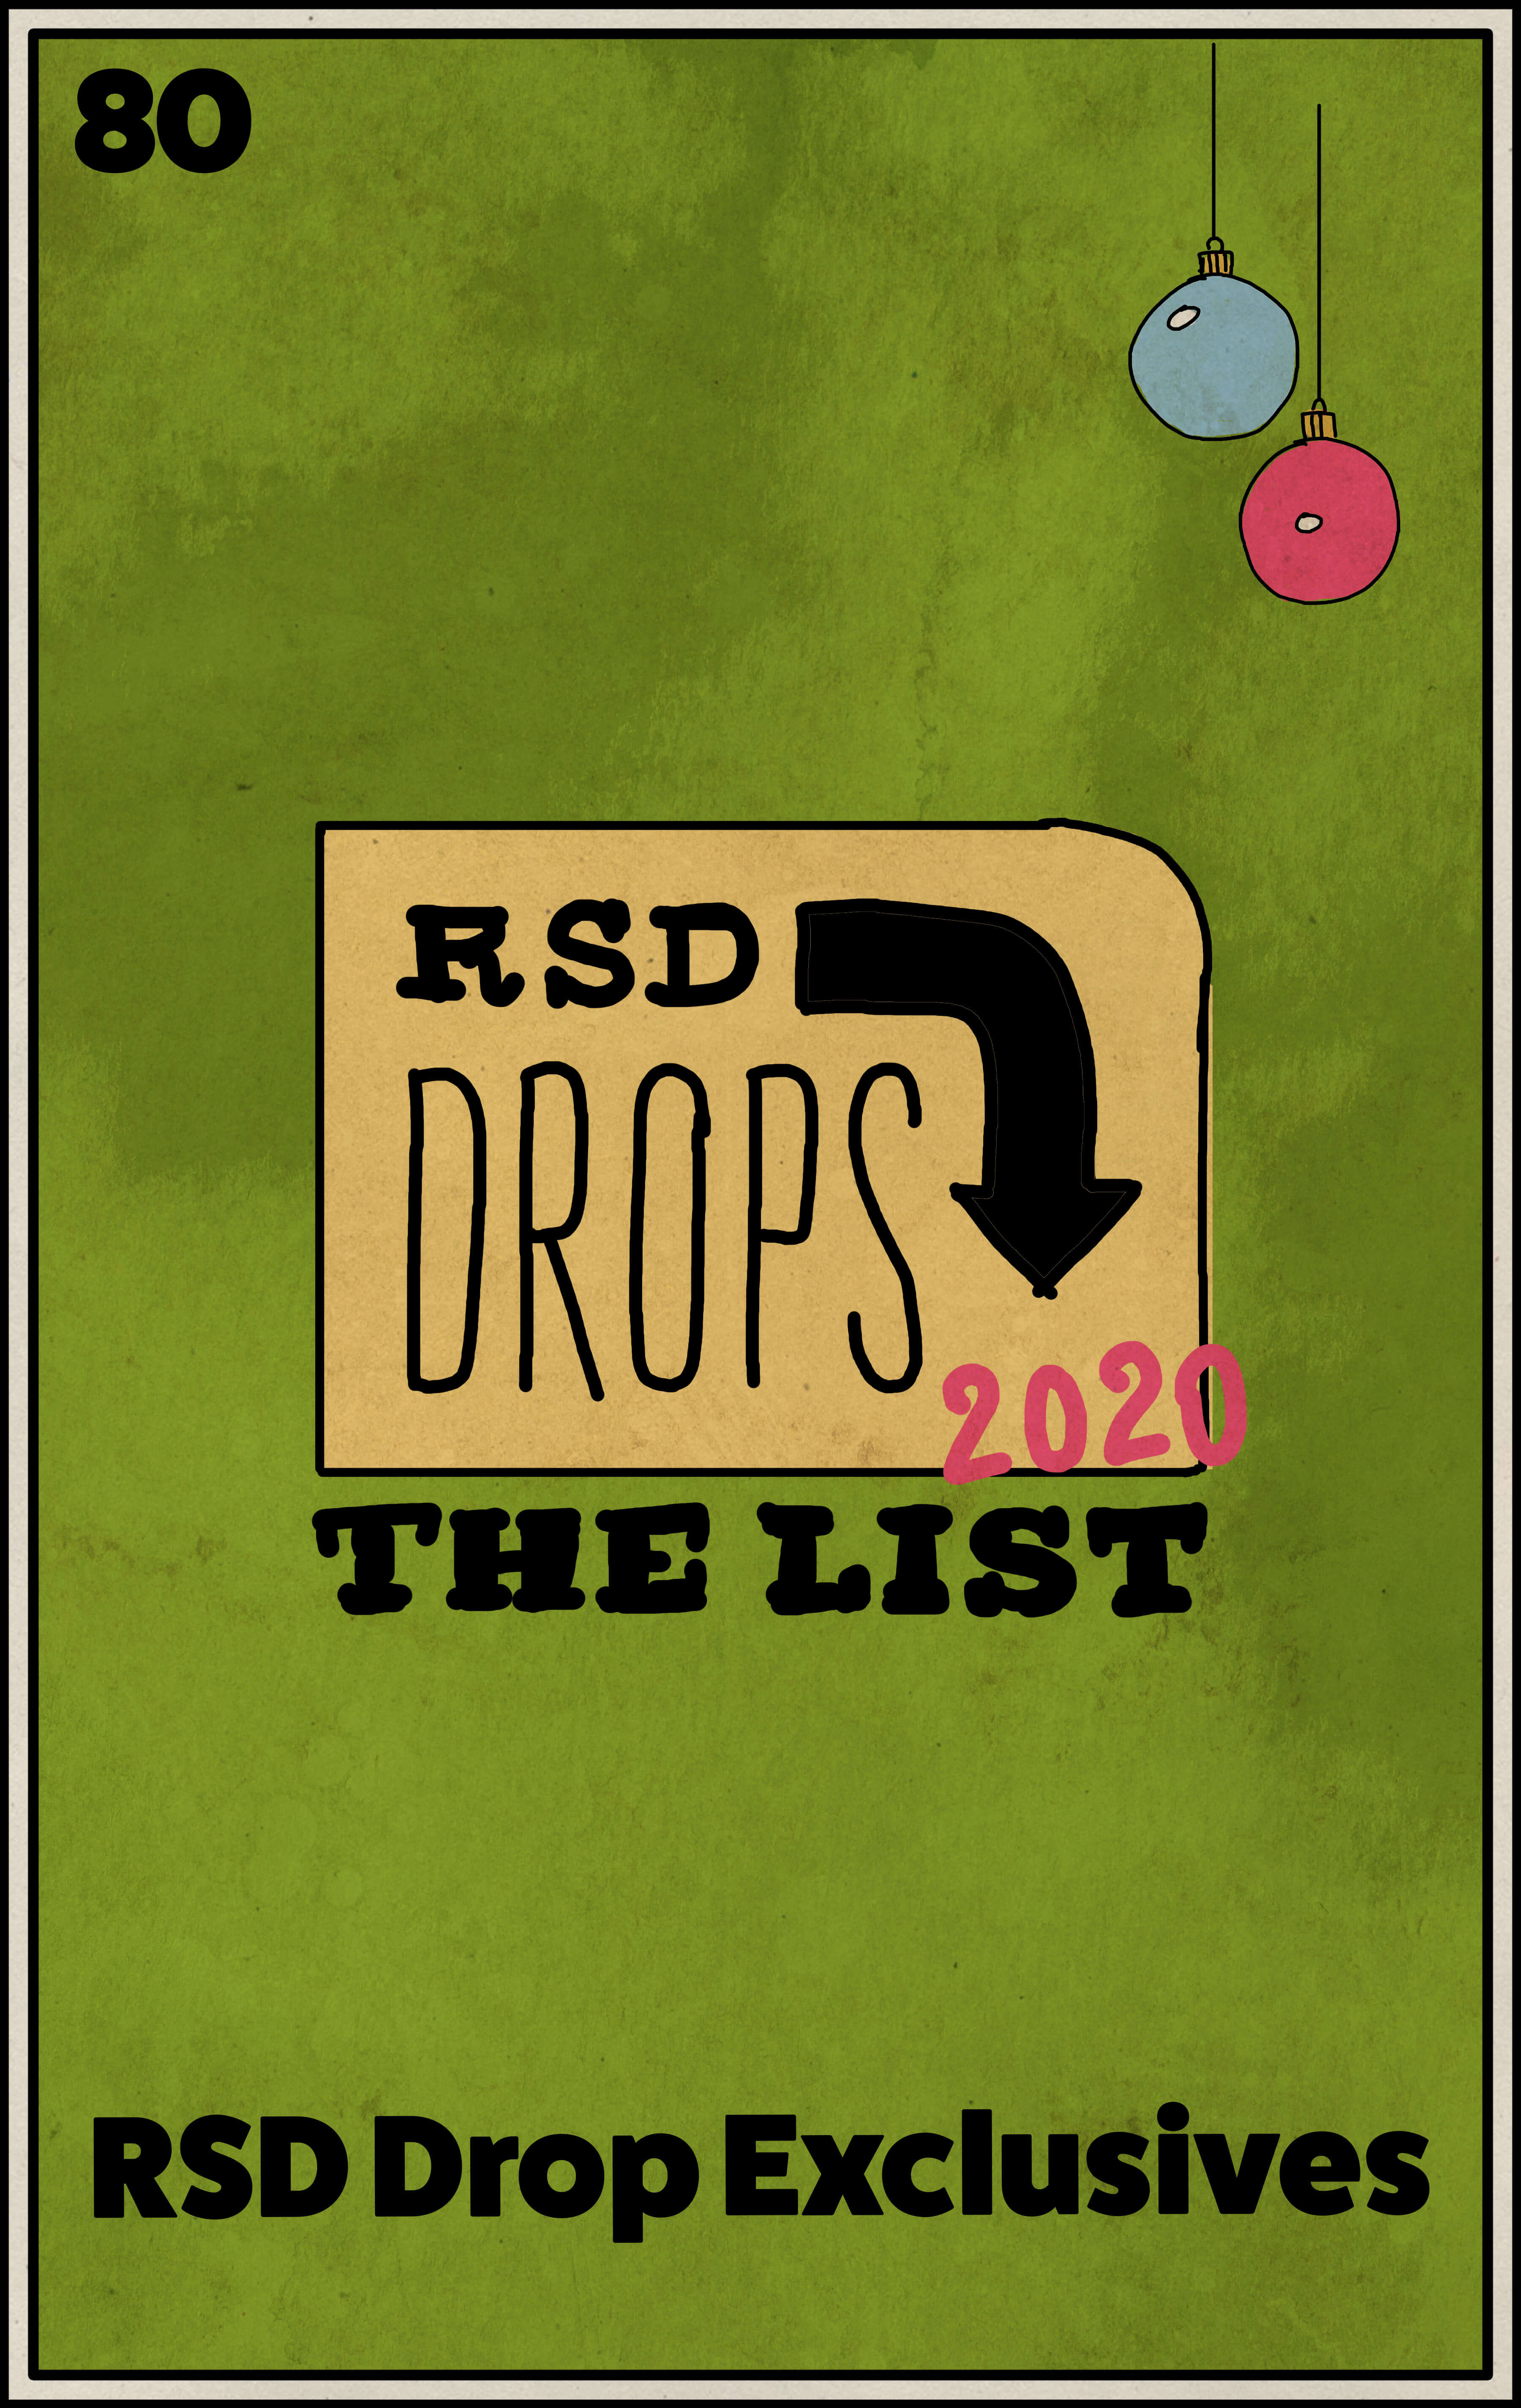 RSD Drops